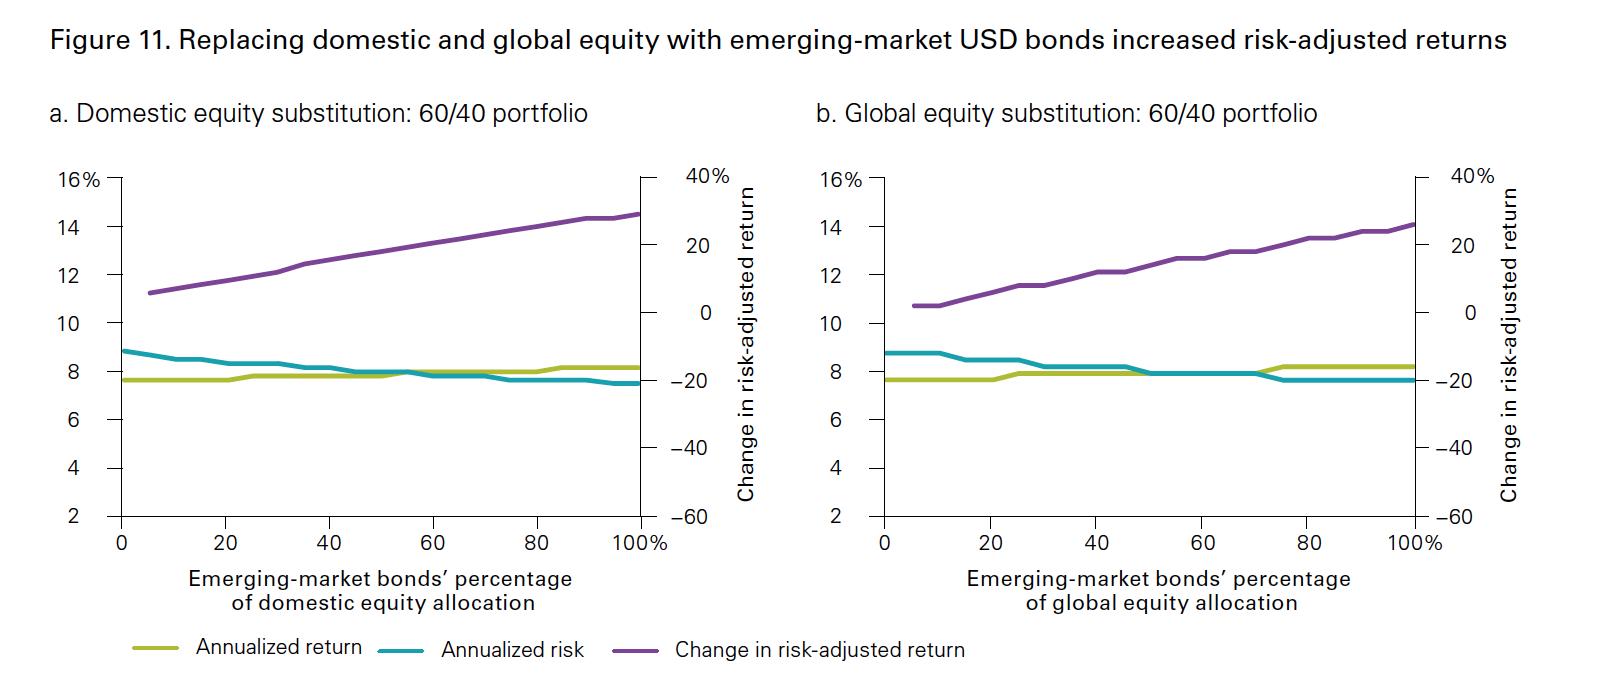 Emerging Market bonds improve portfolio return and volatility - Vanguard backtest